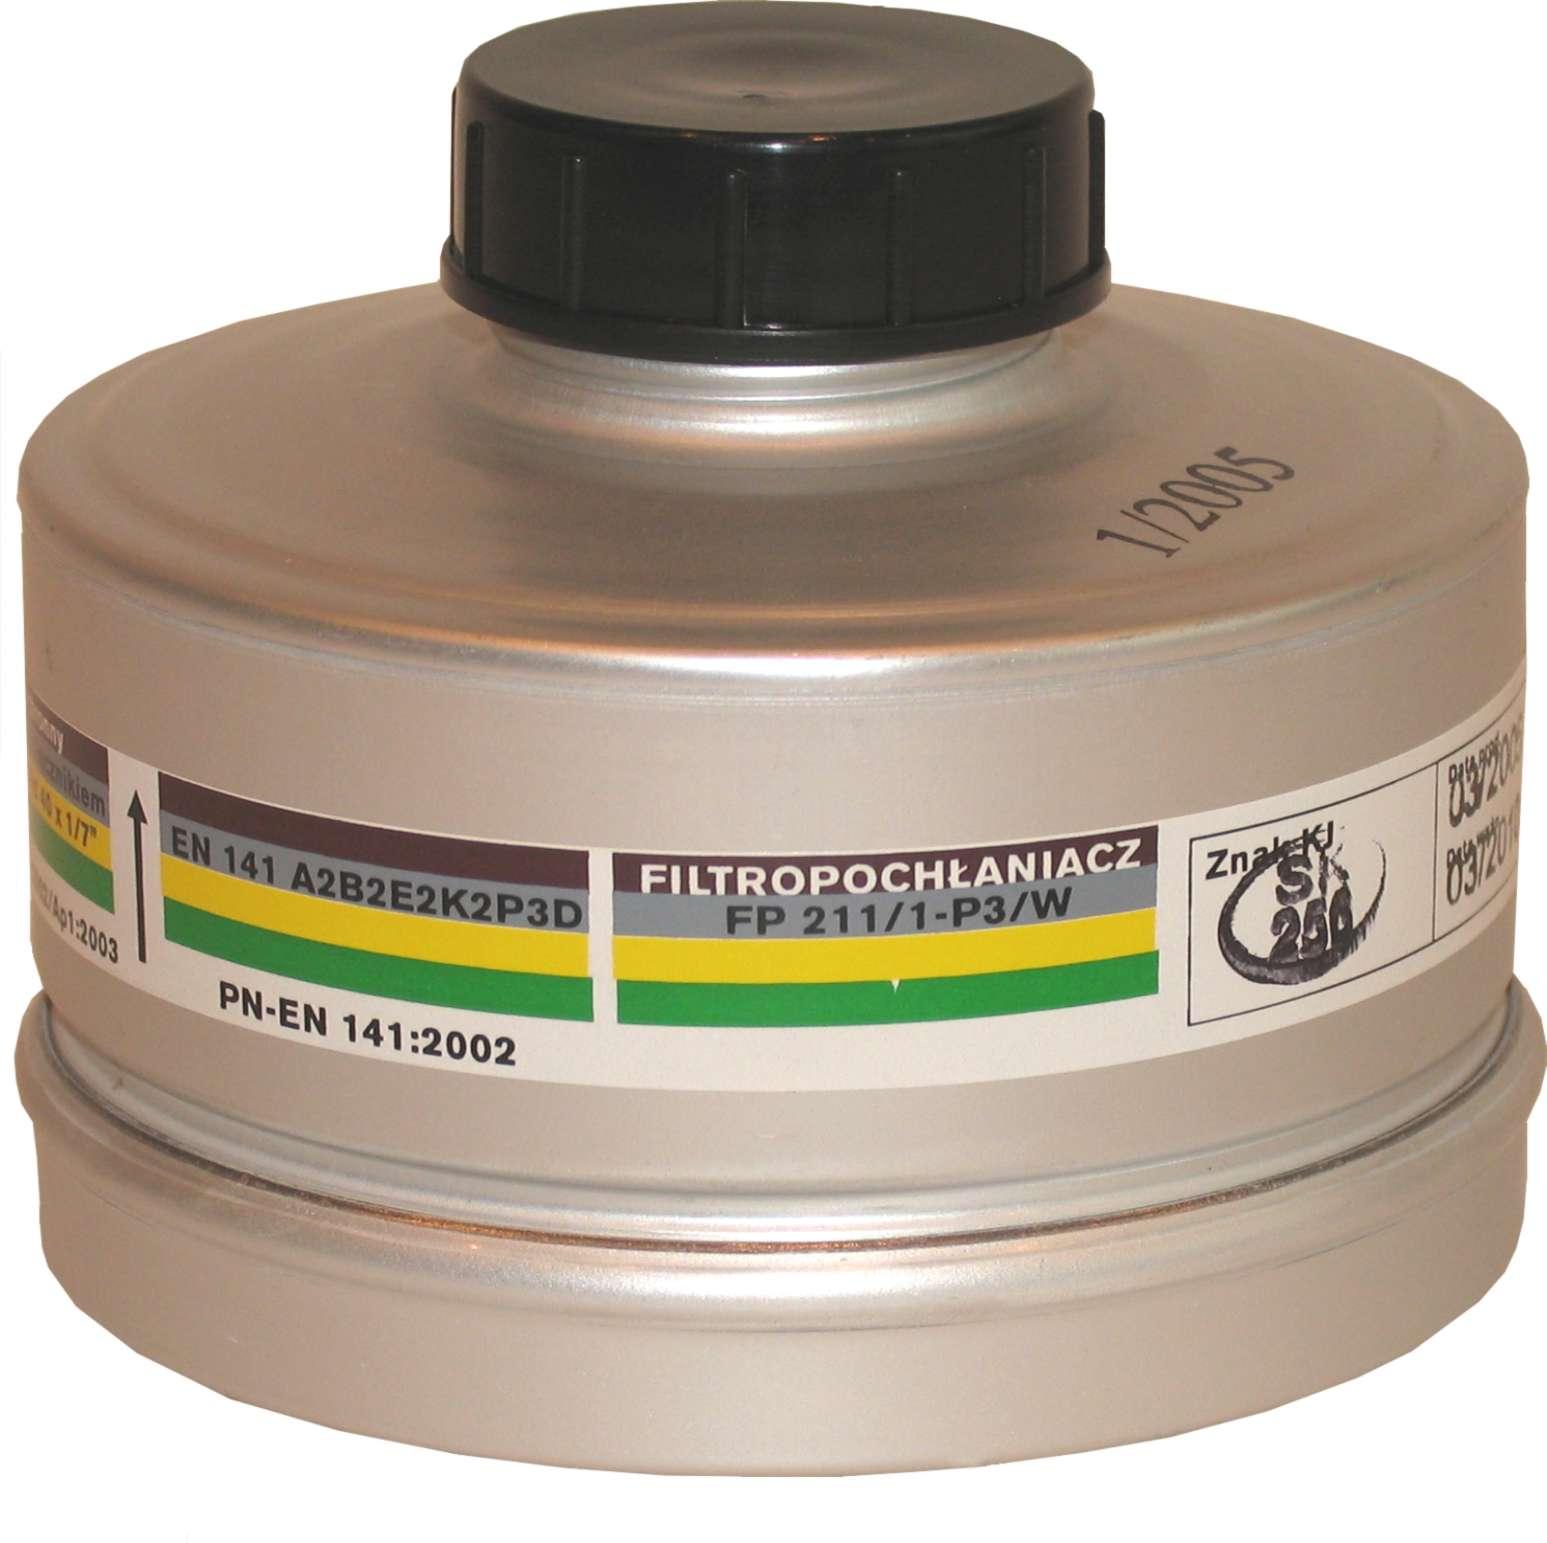 Filtropochłaniacz FP 211/1–P3